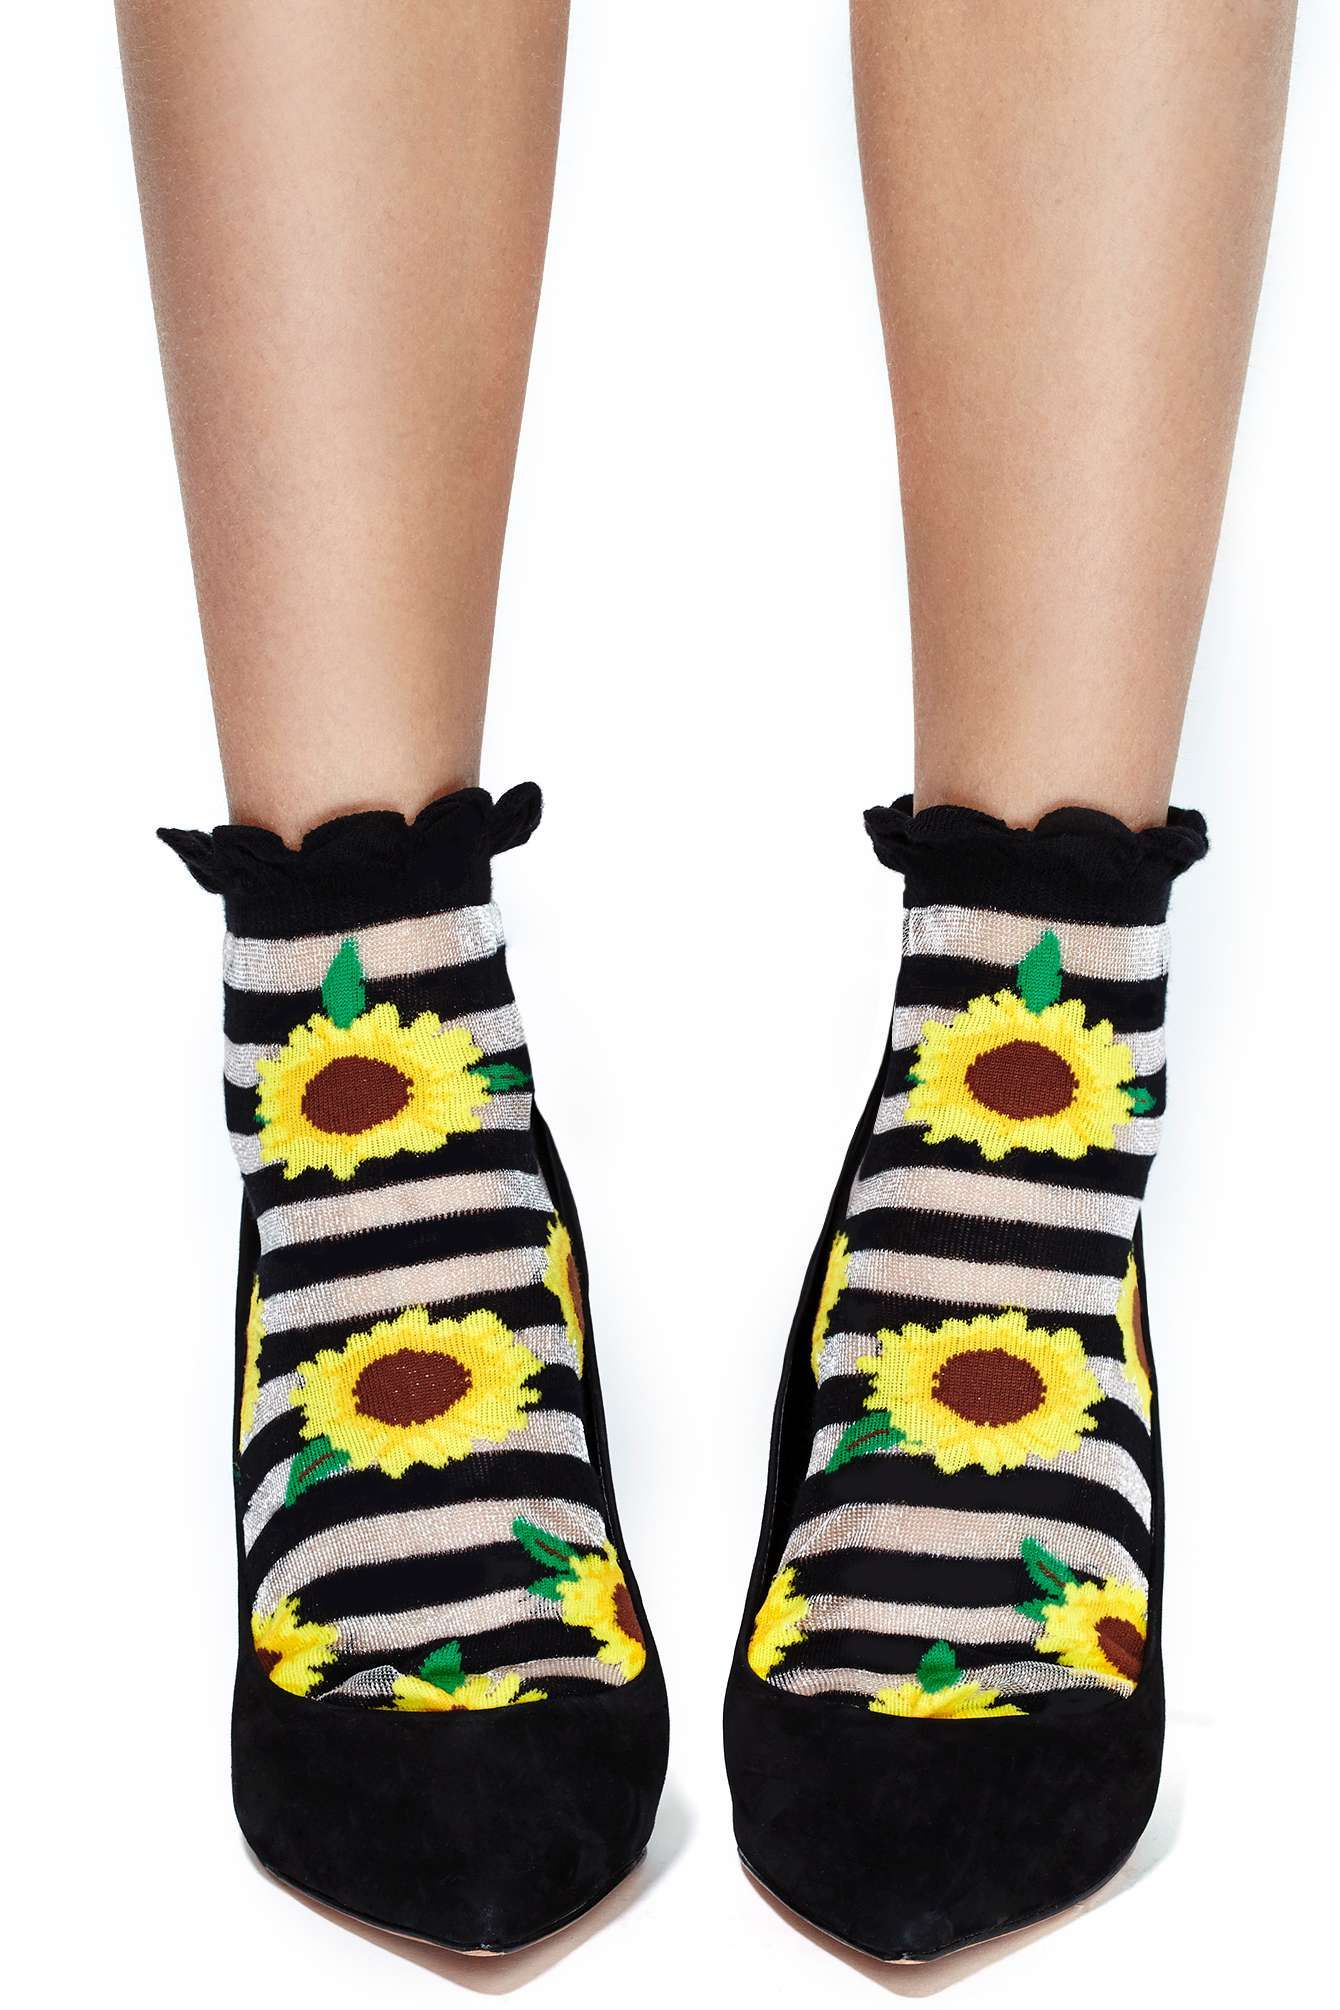 Sunflower Ankle Socks at Nasty Gal